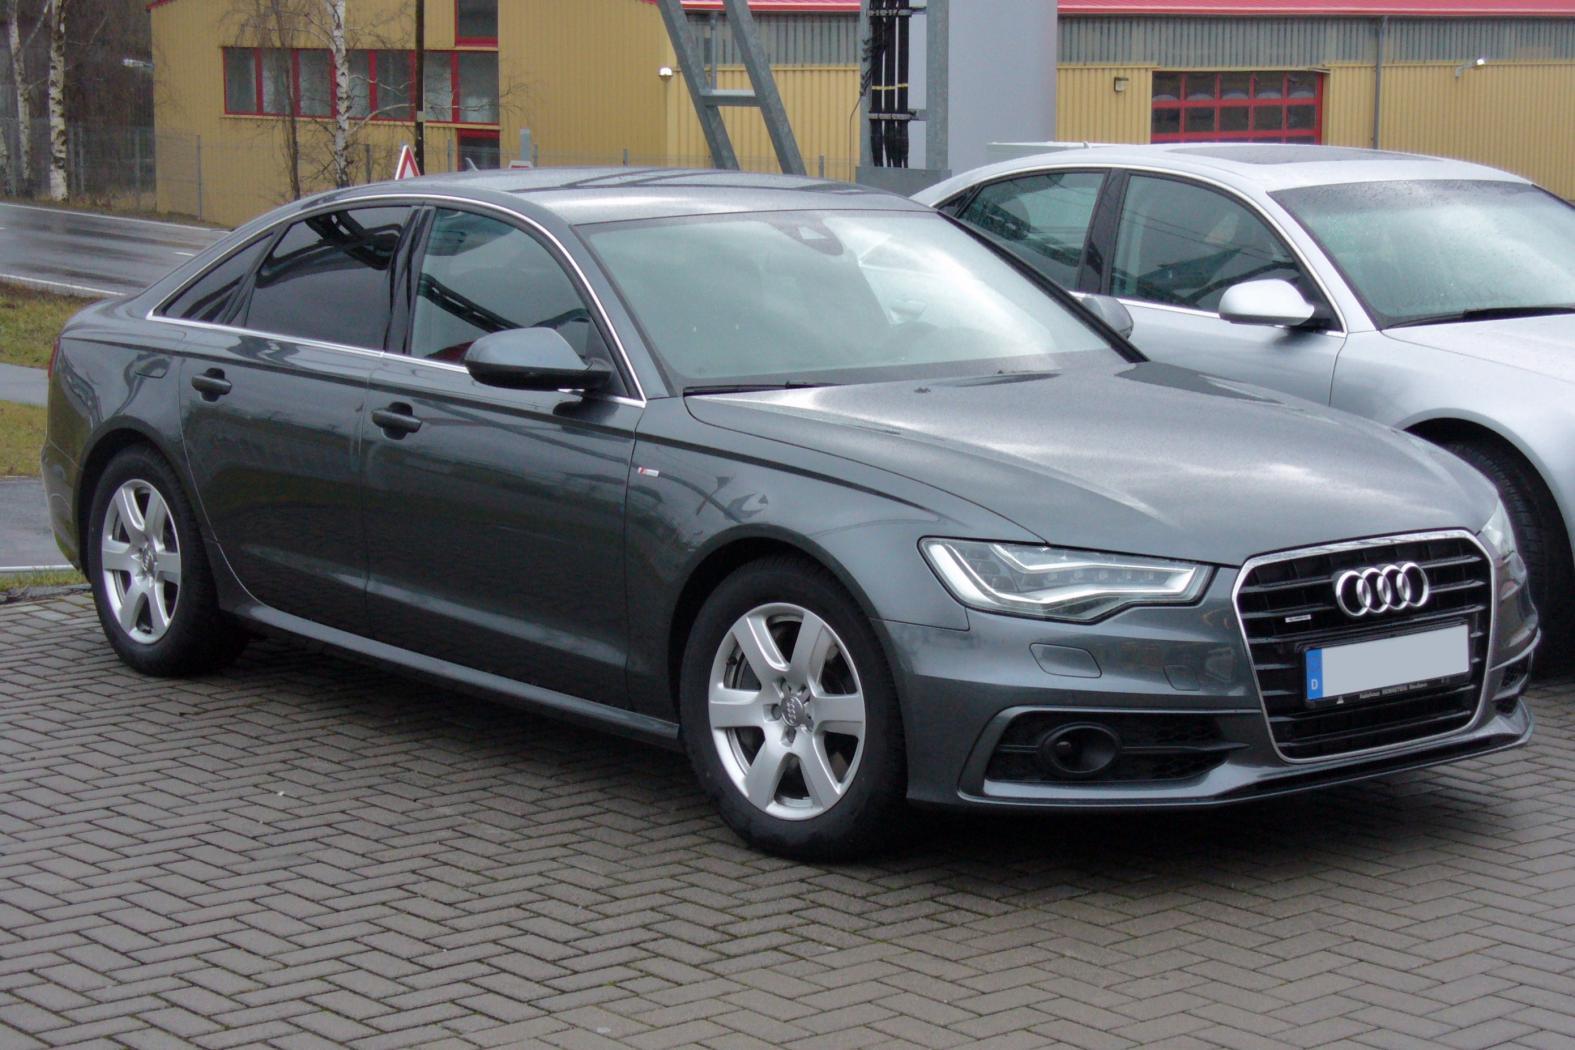 Audi-A6-C7-3